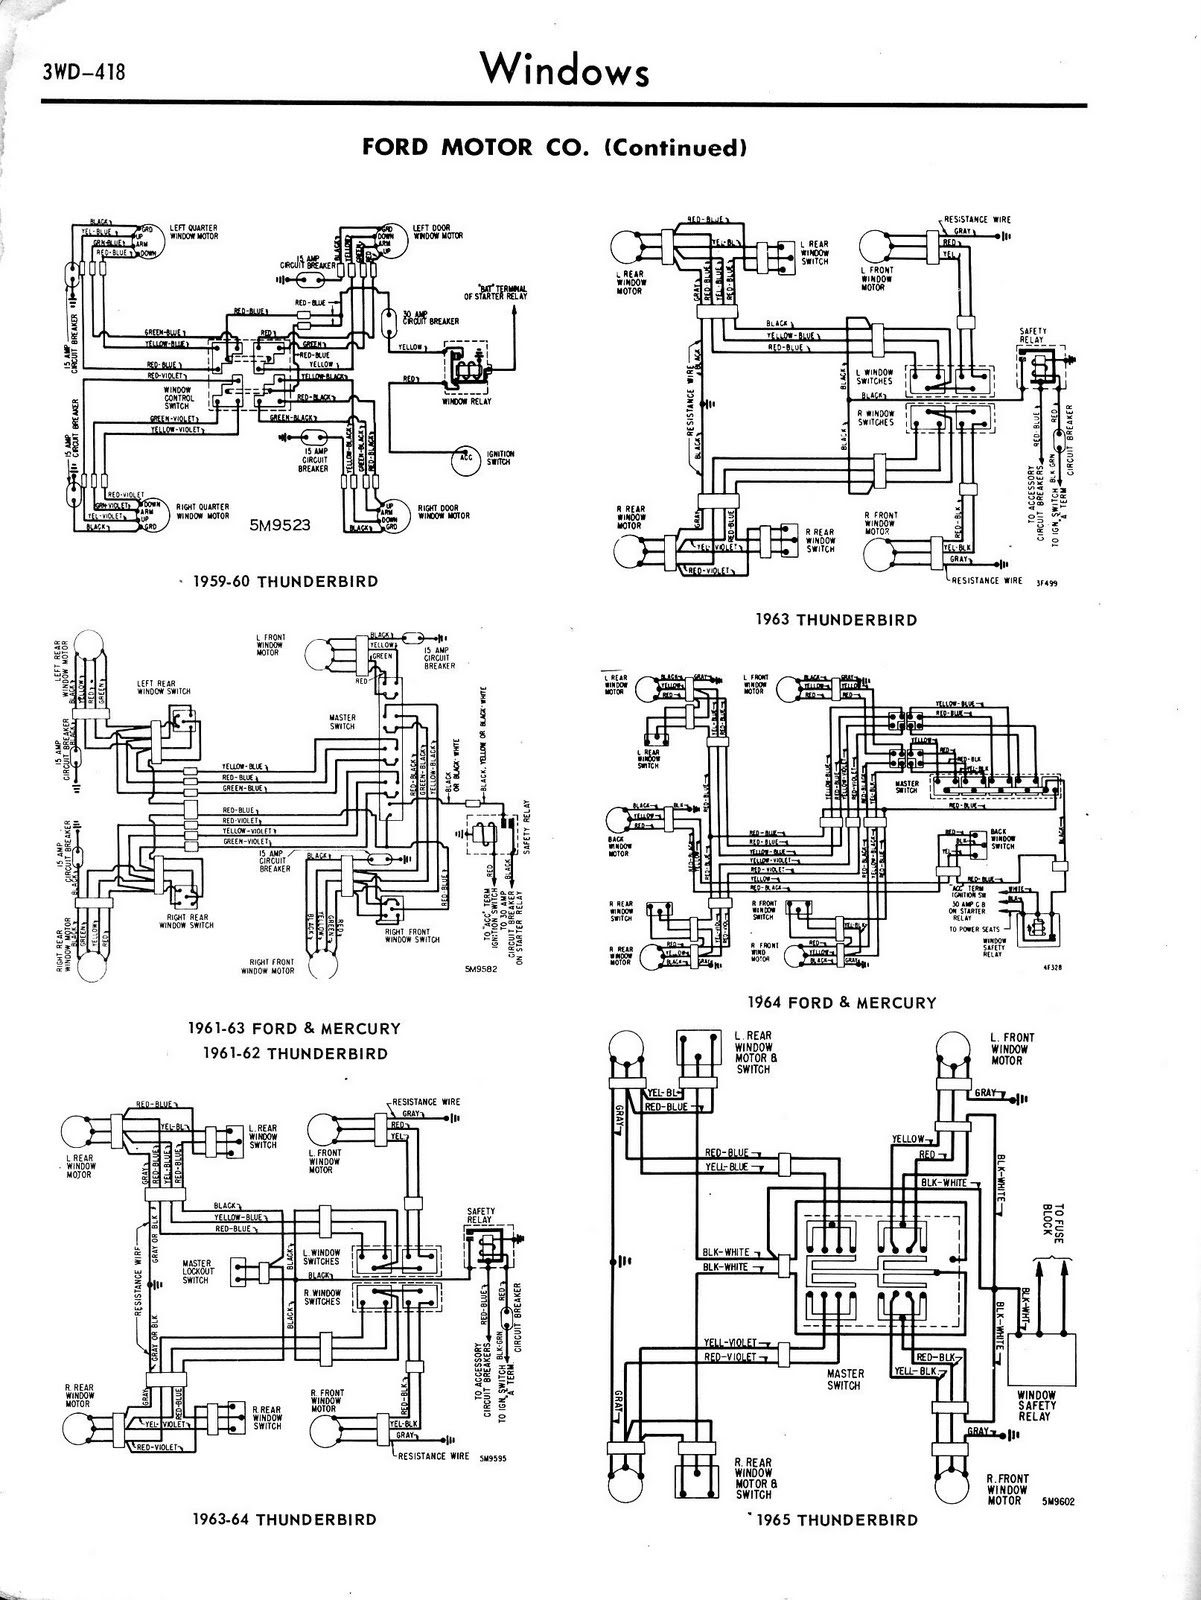 1977 Ford Thunderbird Fuse Box Wiring Diagrams Electric Window Diagram 1976 92 Library Rh 31 Yoobi De 1979 1975